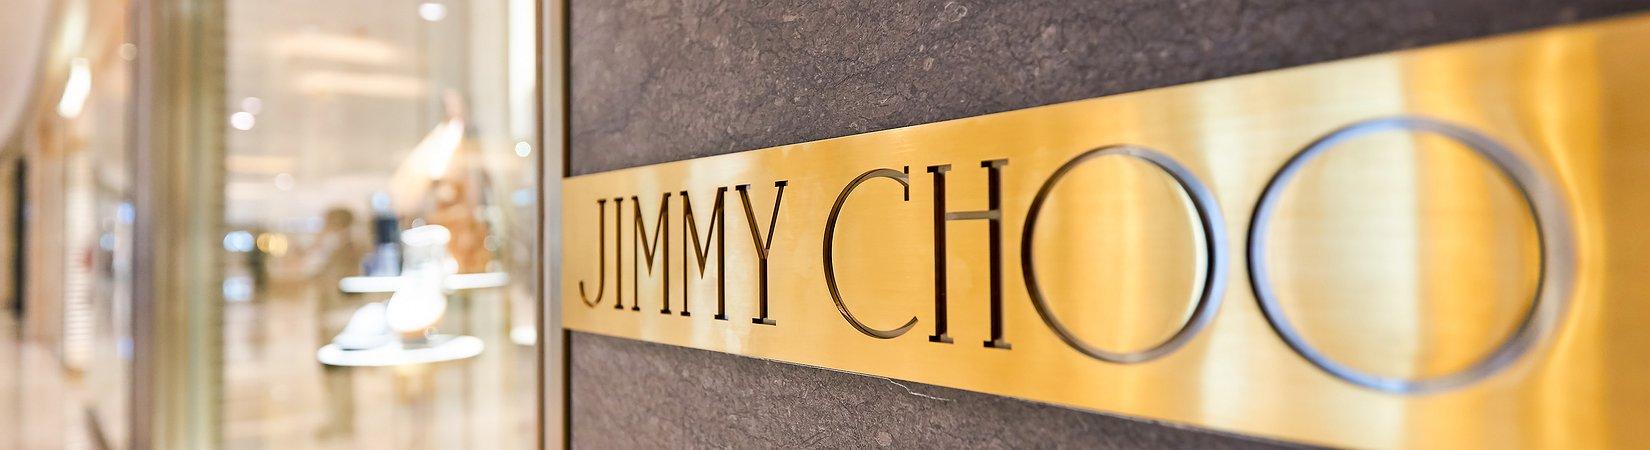 Michael Kors compra Jimmy Choo por 1.200 millones $